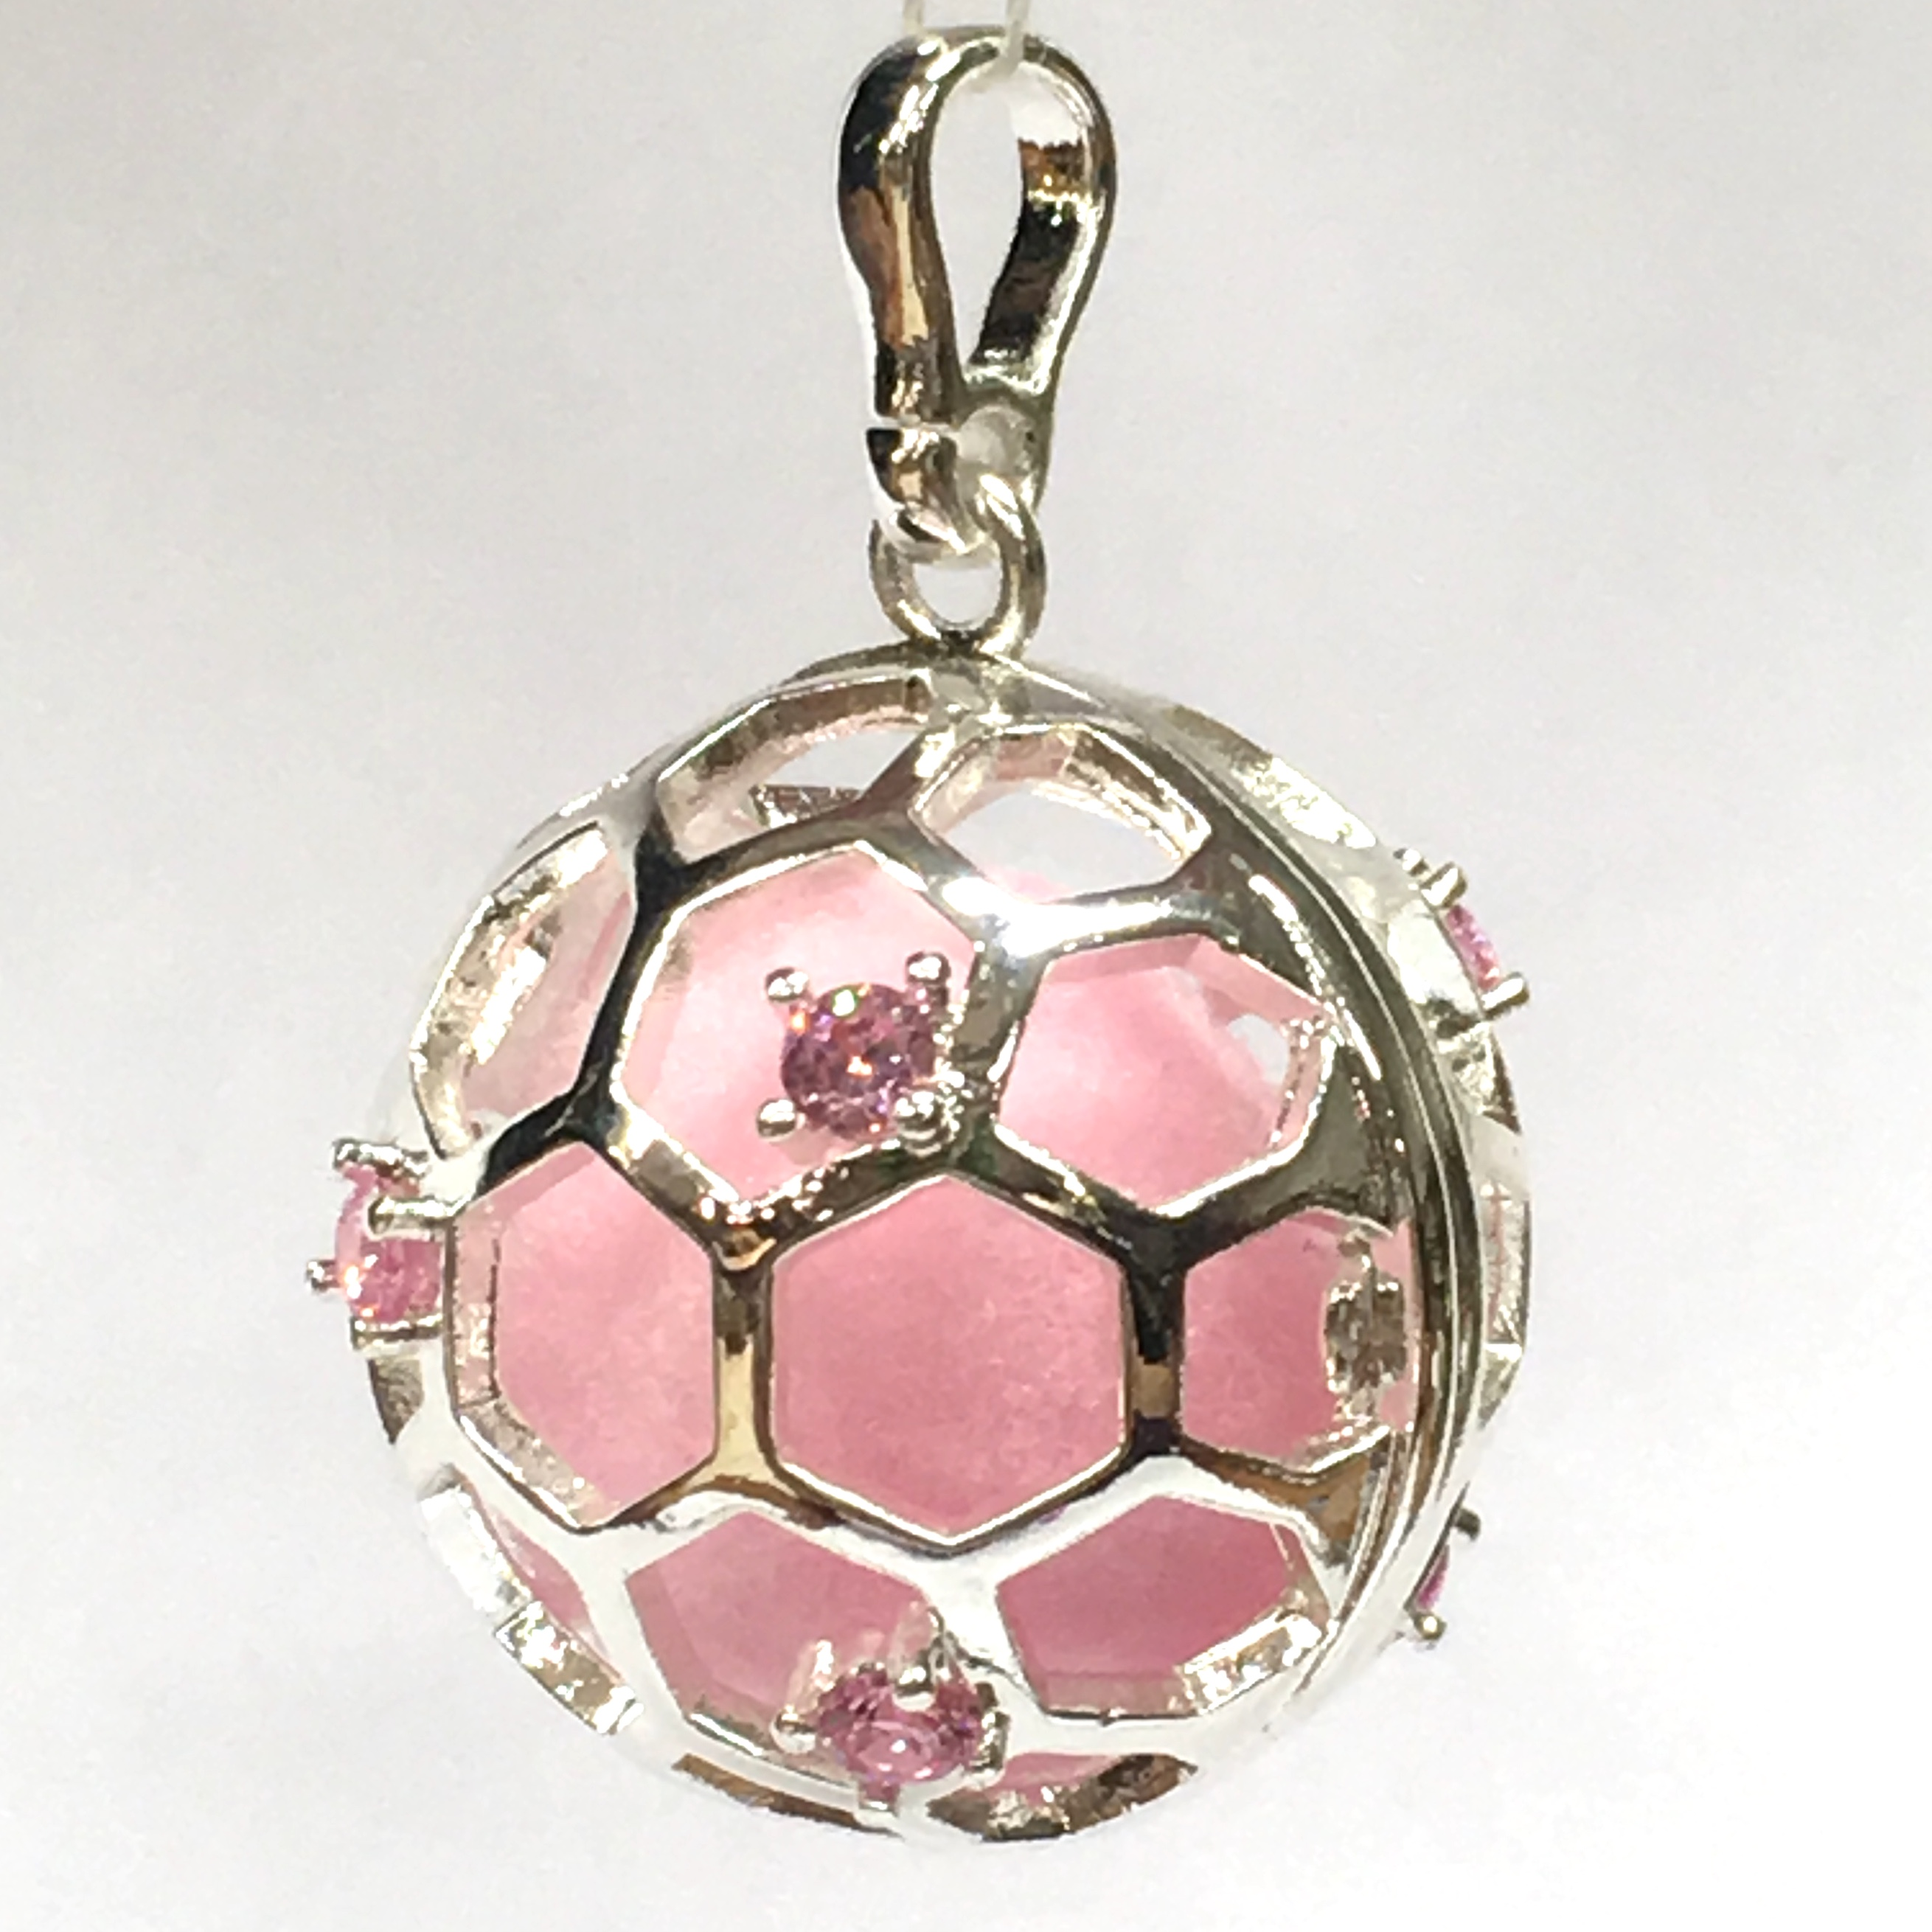 Aroomiteraapia ripats hõbedane roosa tsirkooniga, 20mm (2735)5